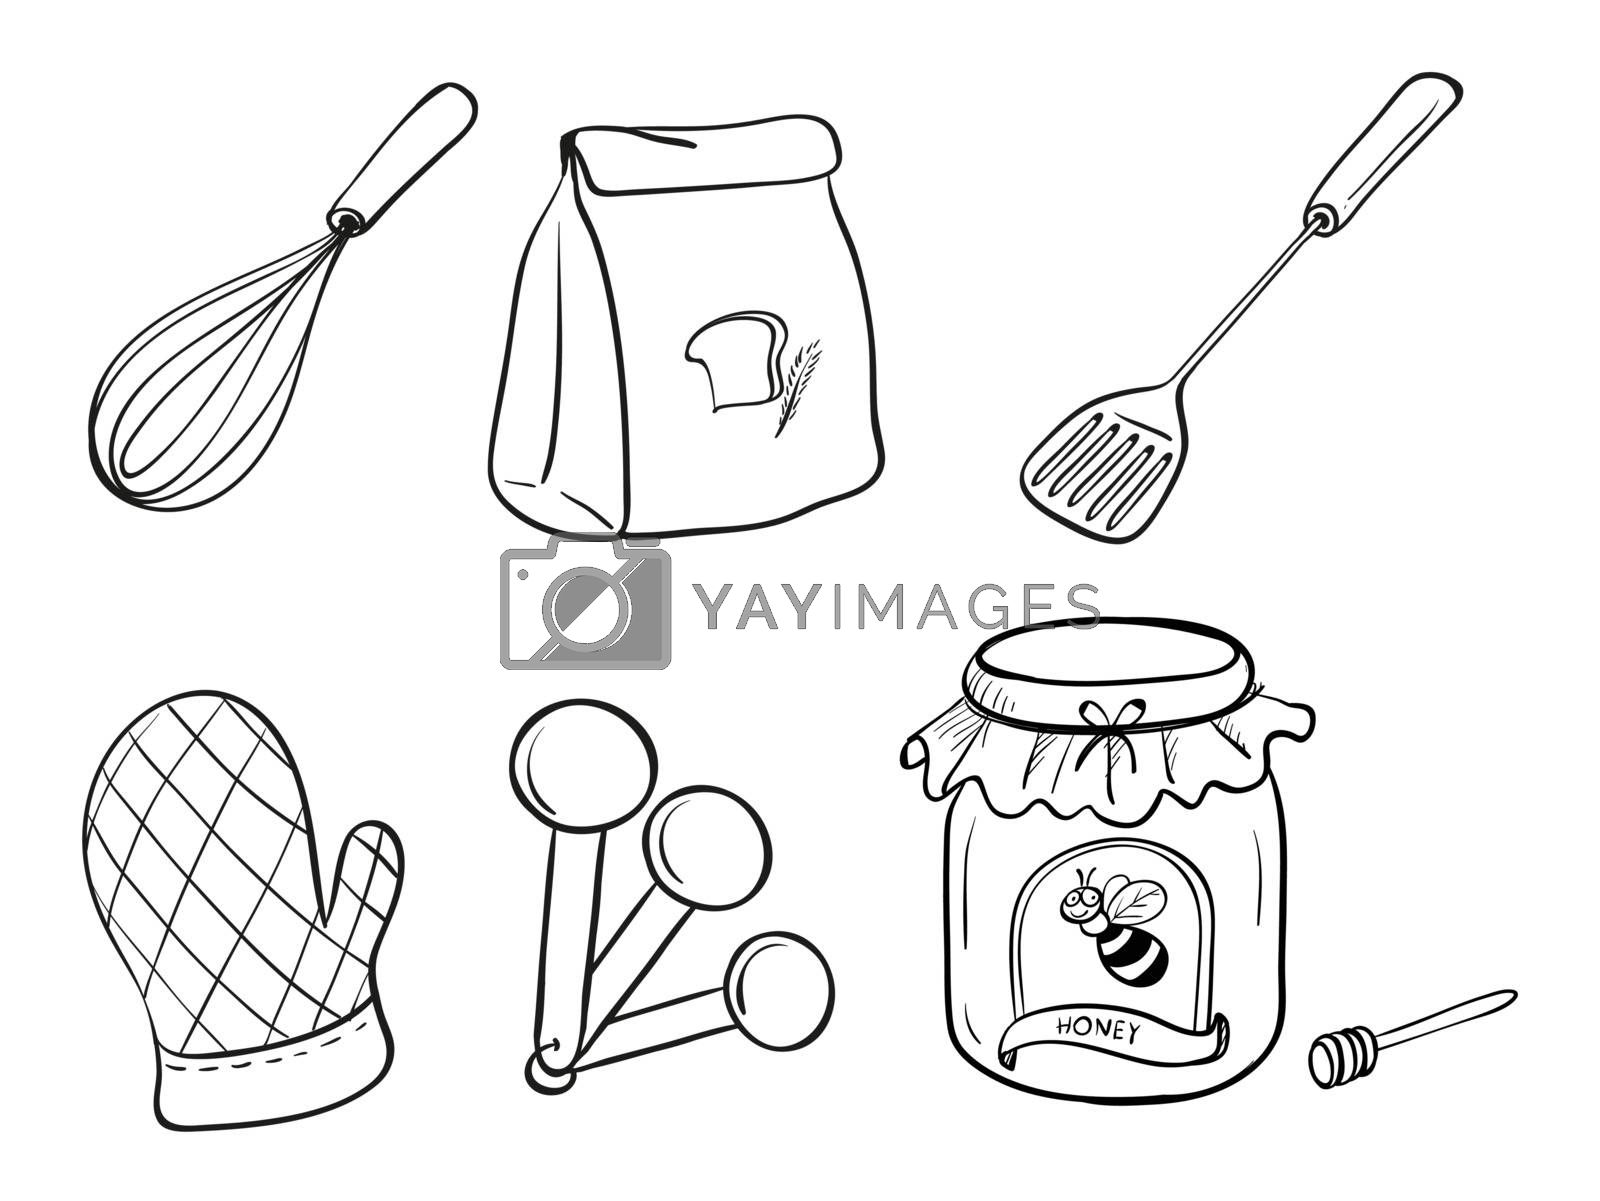 Illustration of a doodle set of kitchen utensils, baking powder and honey jam on a white background